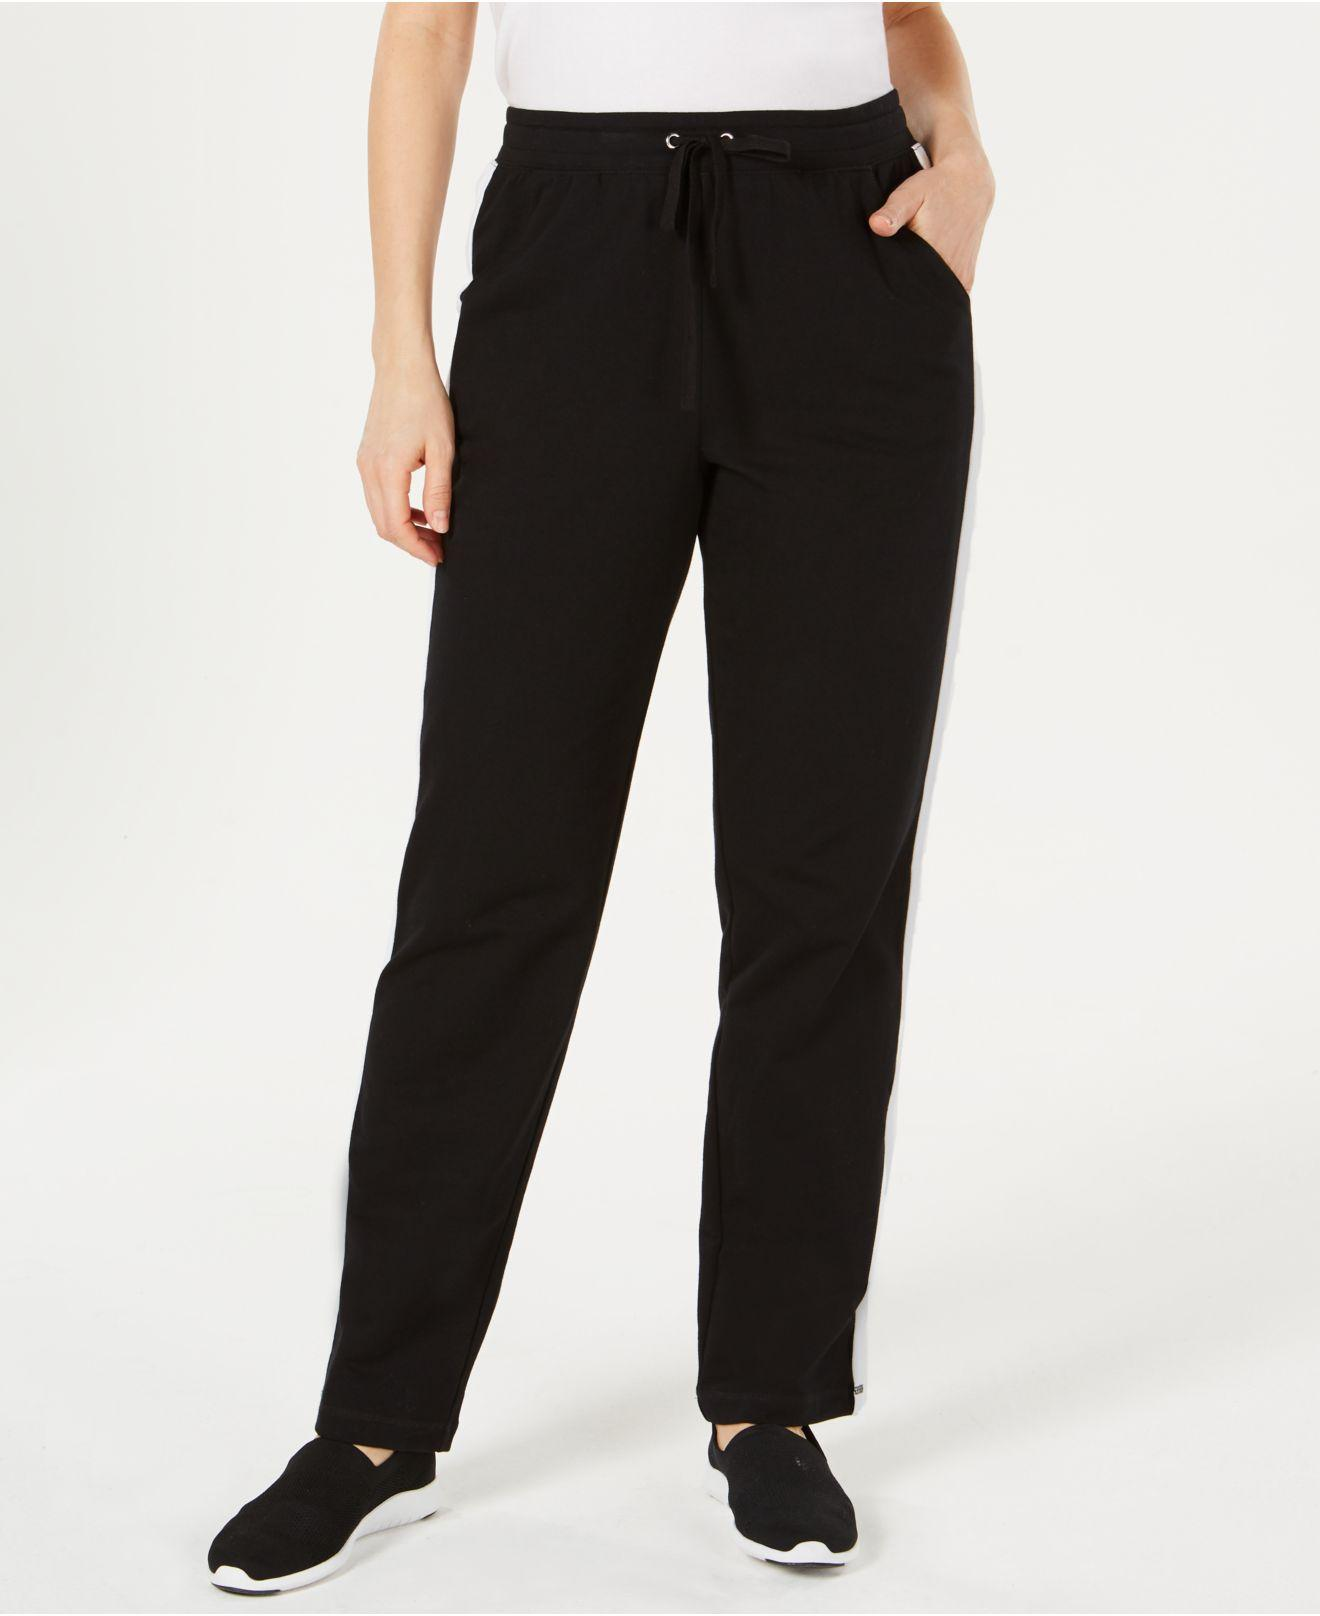 6dc33a0dcf5 Lyst - Karen Scott Colorblocked Stripe Pull-on Pants